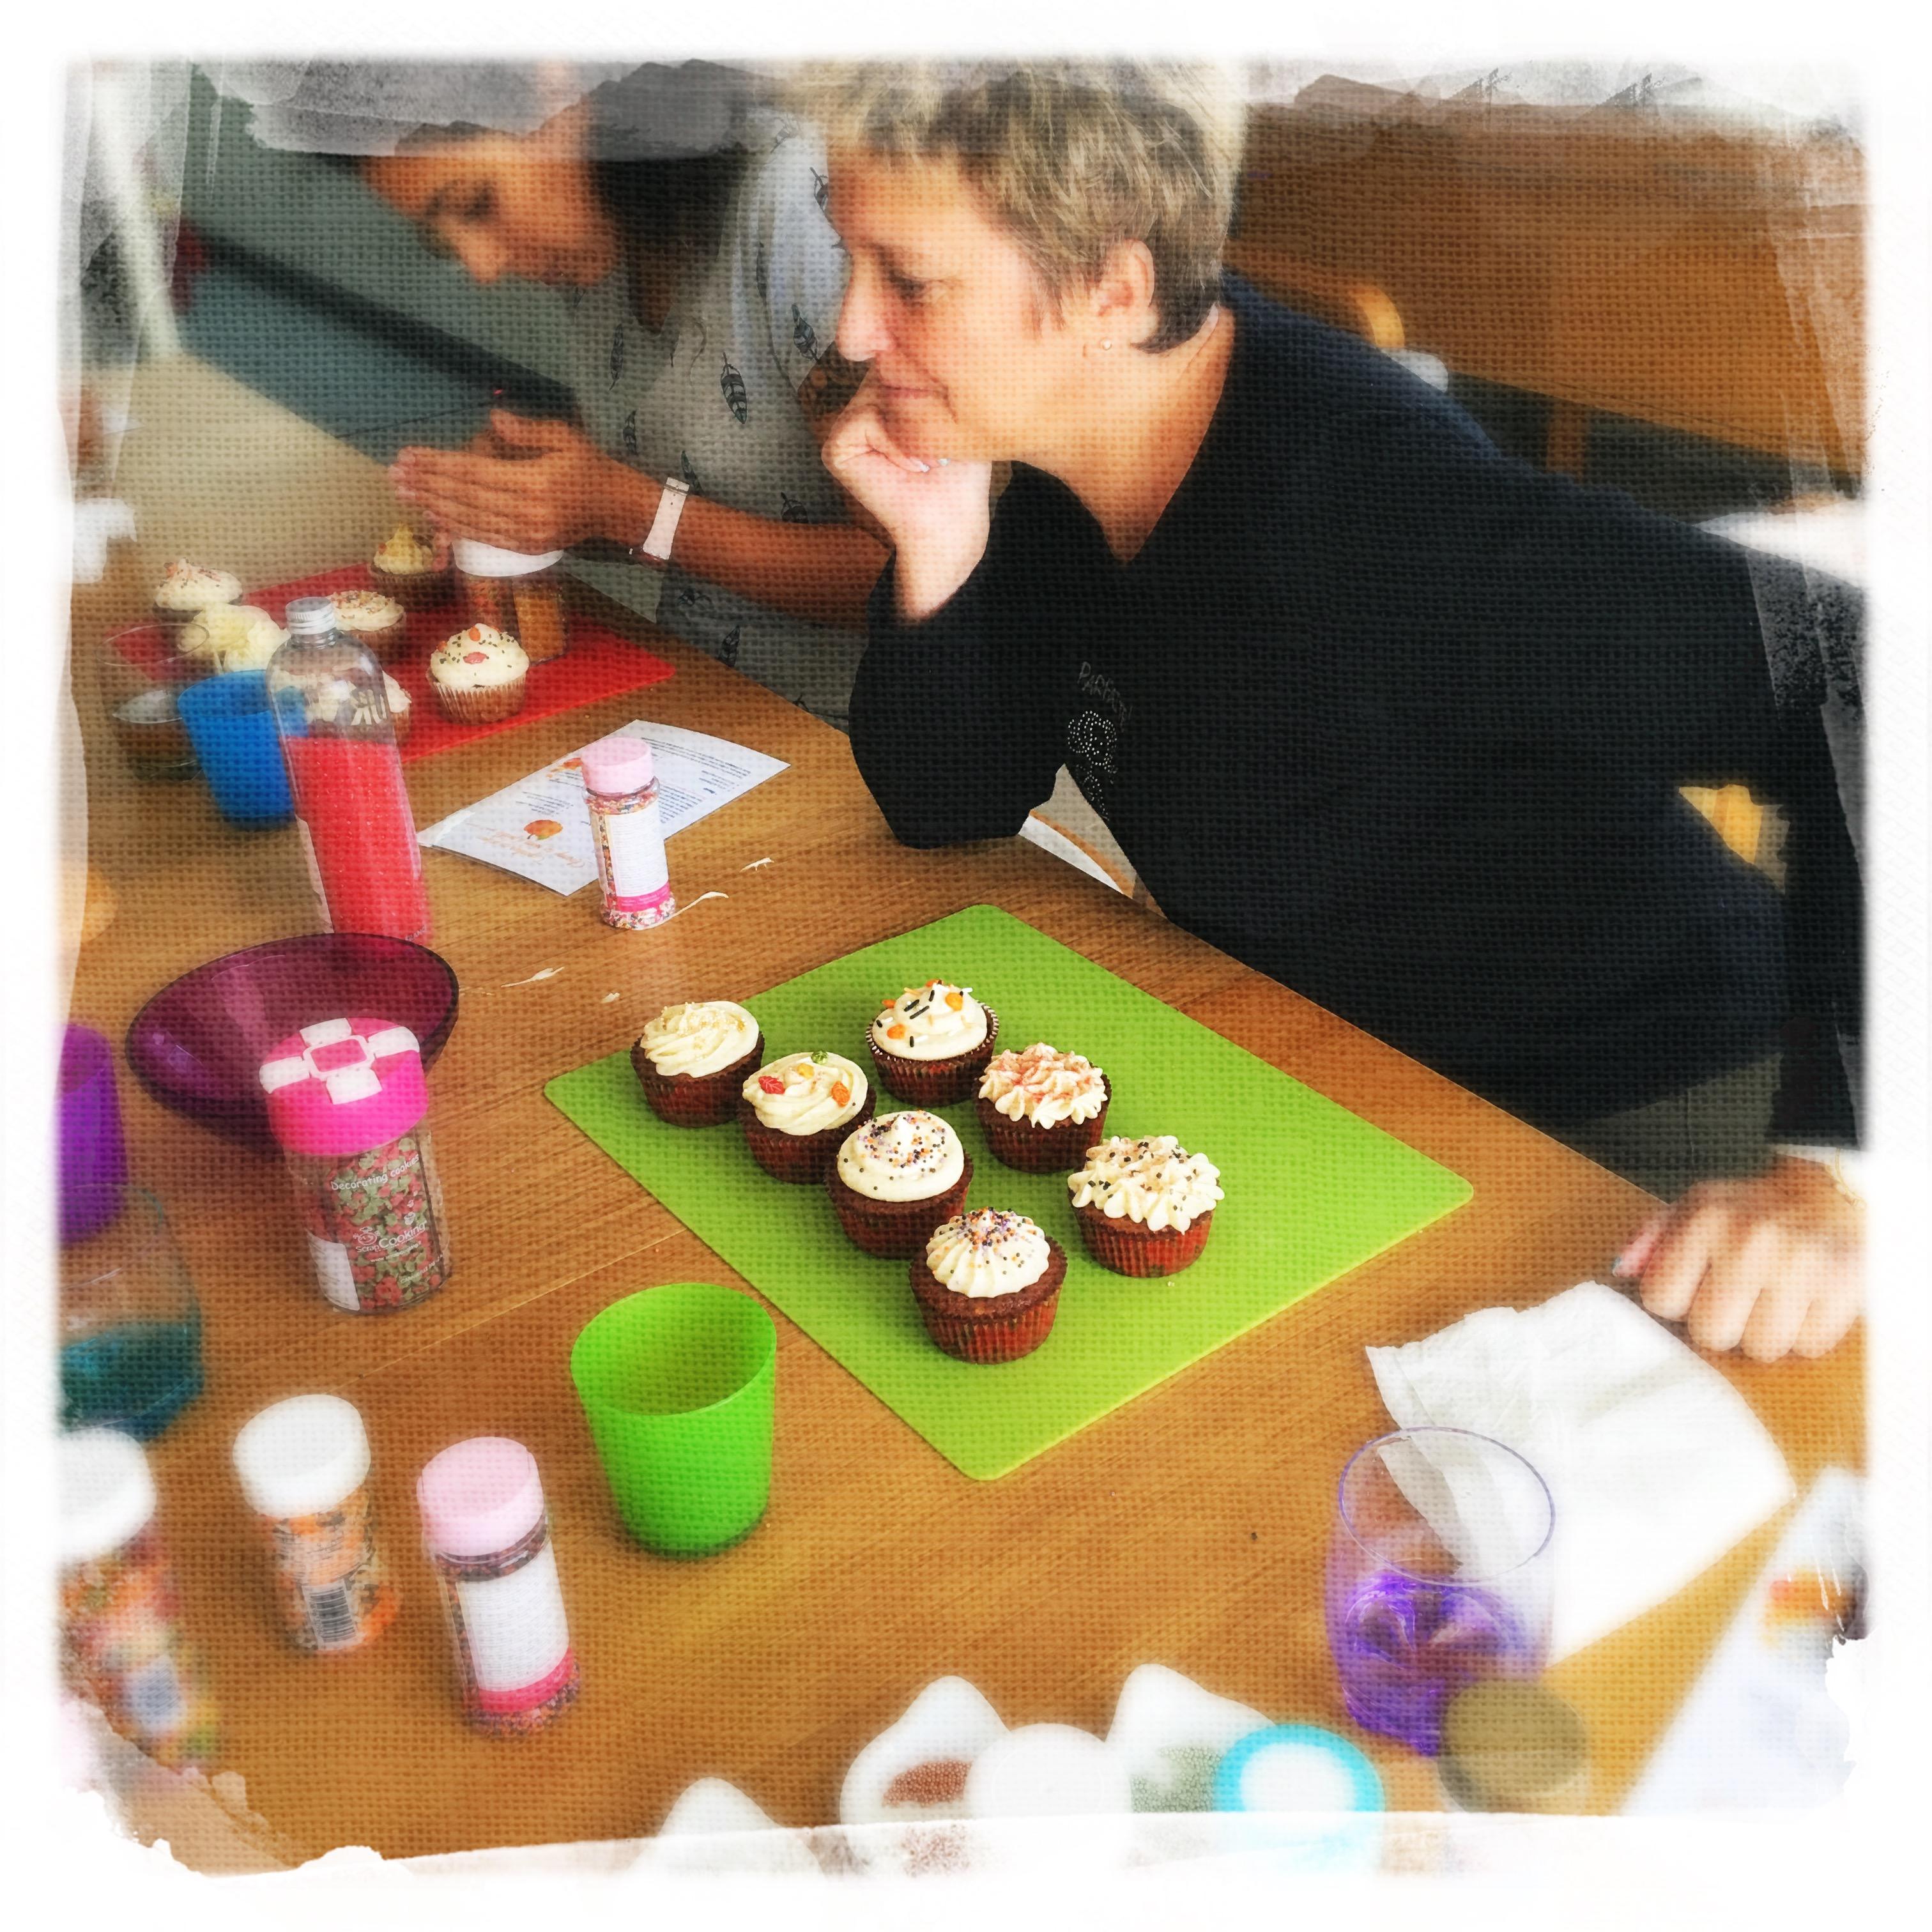 Cupcake Potiron/Sirop d'érable XVIII